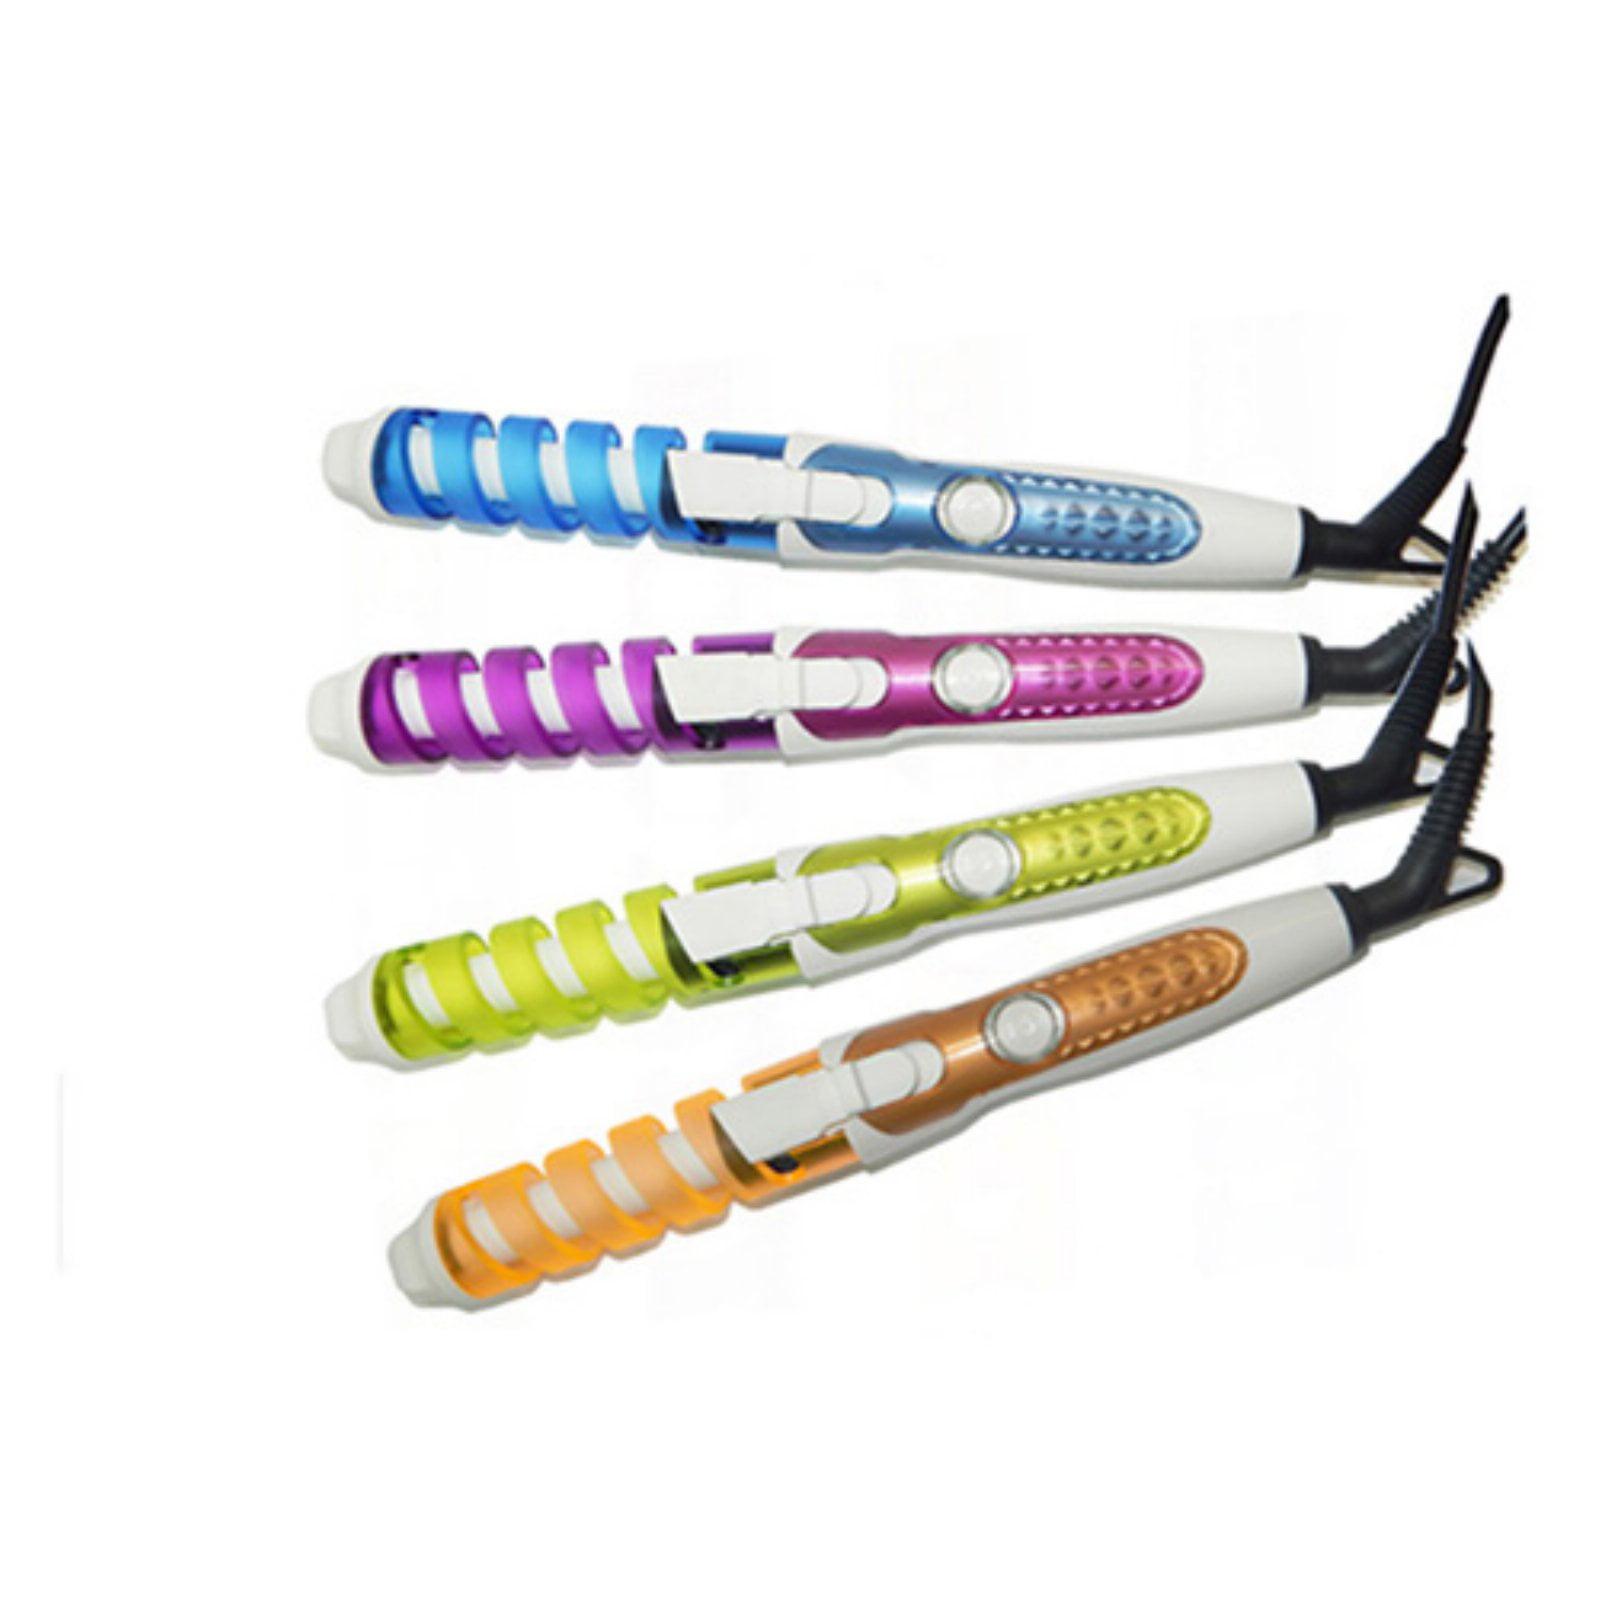 Z-Comfort Premium Neon Hair-Curling Iron